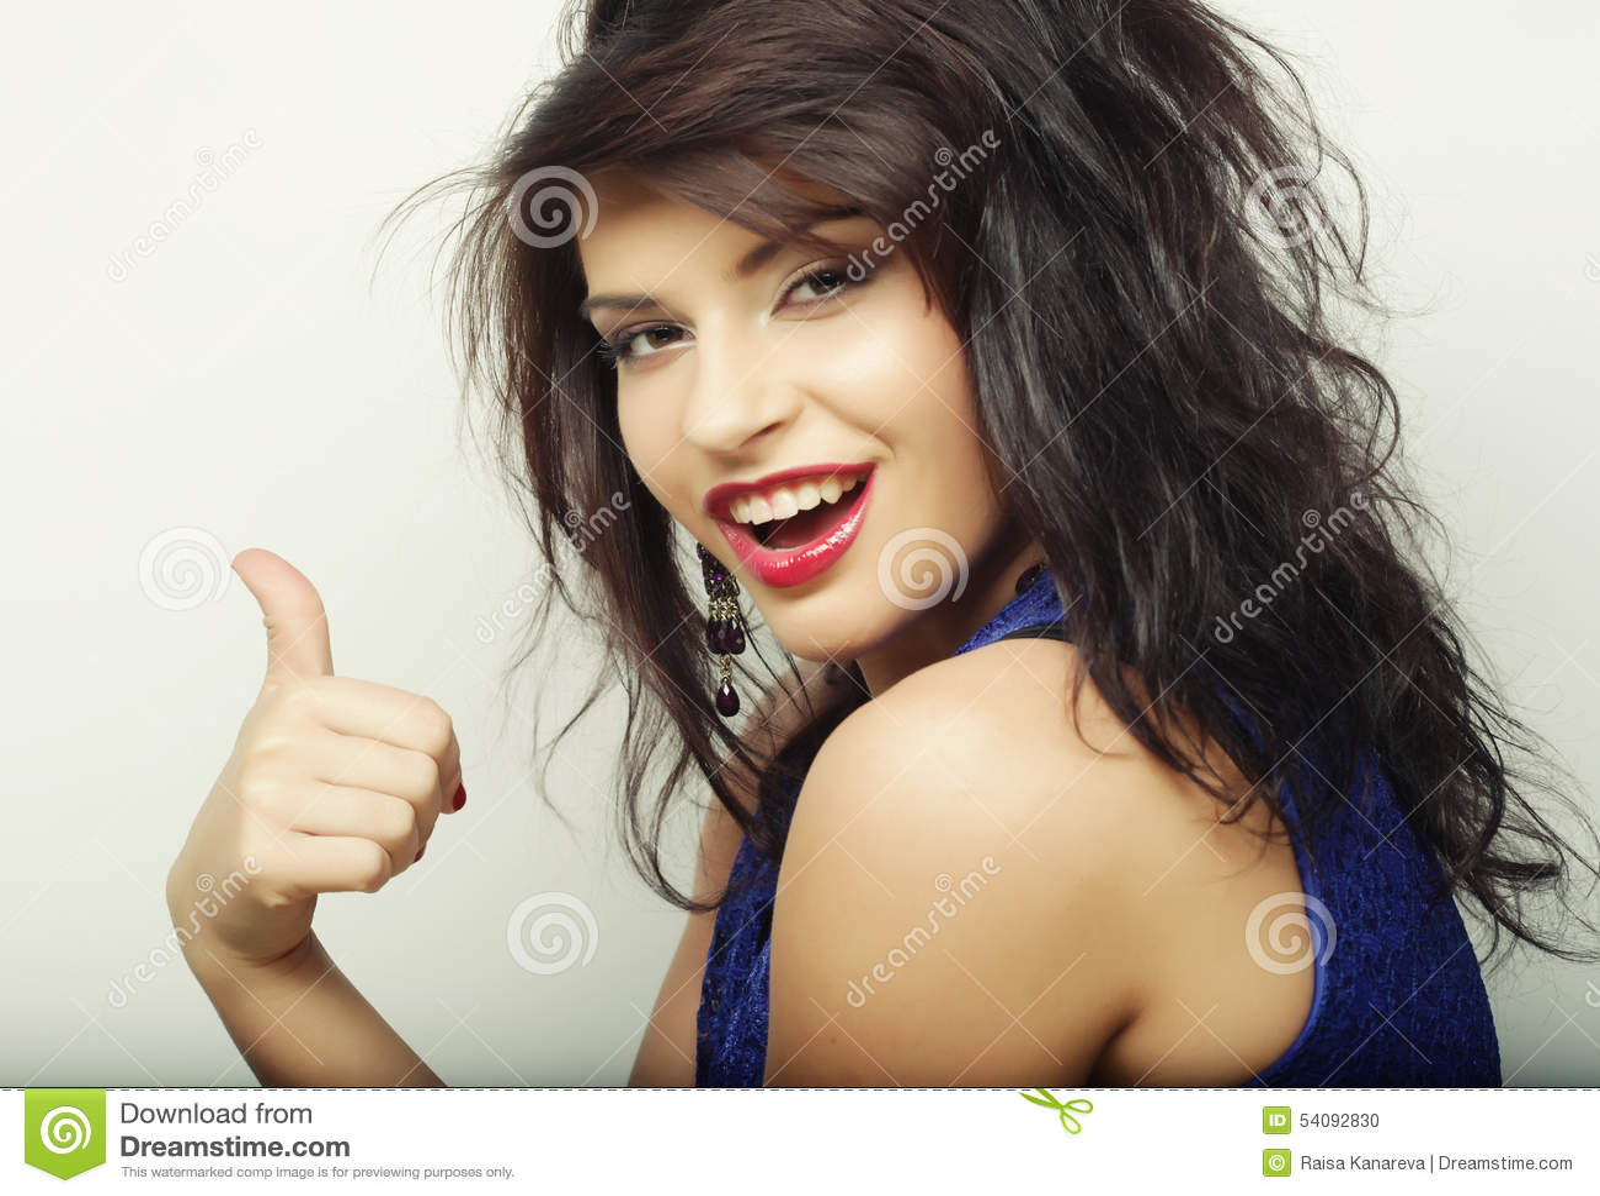 Mooie vrouw met grote gelukkige glimlach